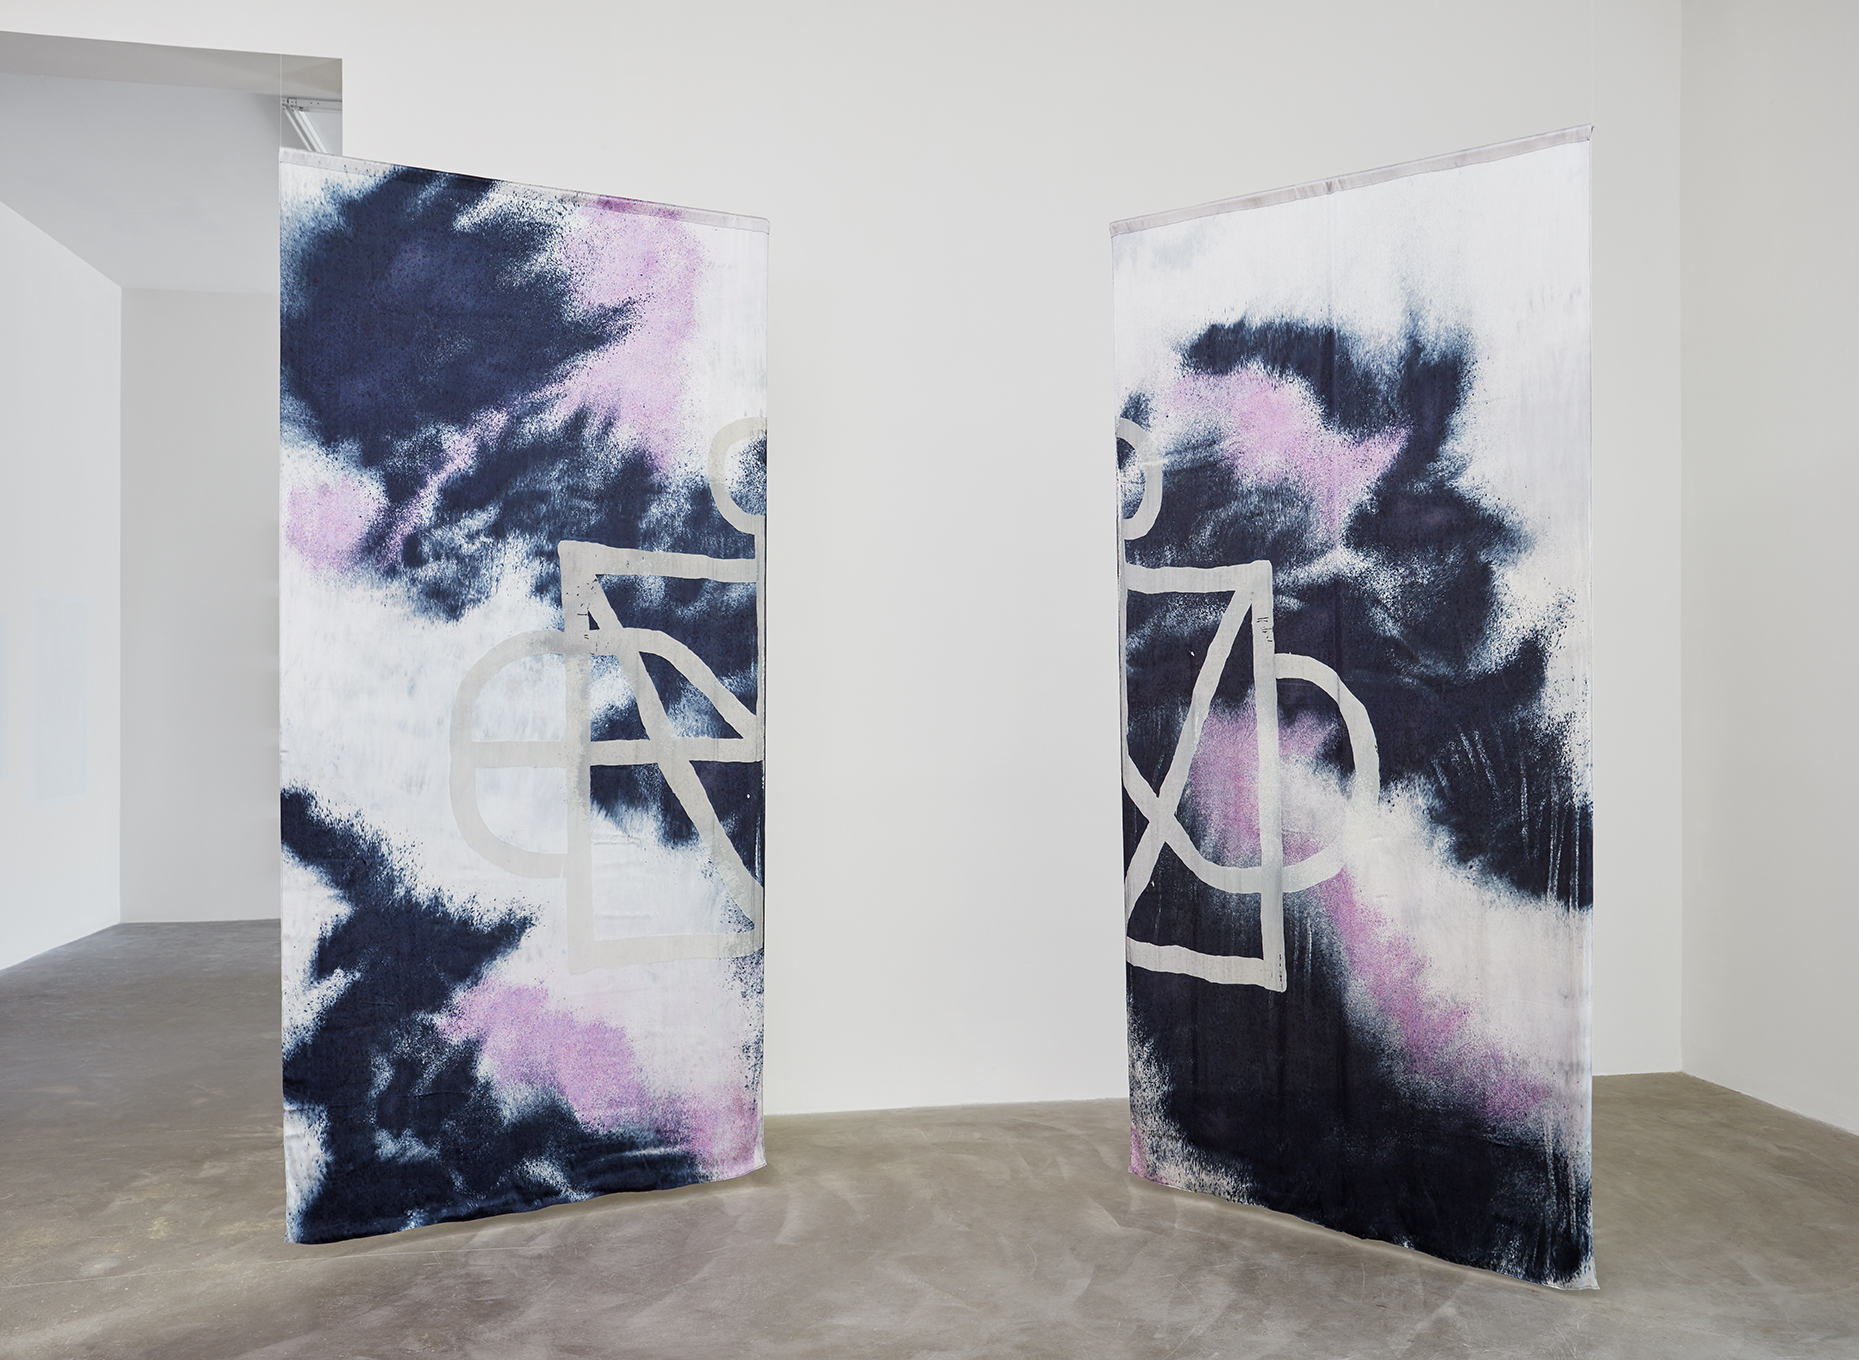 AA Bronson & Richard John Jones, Flesh of Our Flesh (Curtains), 2014 silk, viscose, polyester dévoré. 6 elements 280 x 260 cm - 110 1/4 x 102 3/8 inches (each)